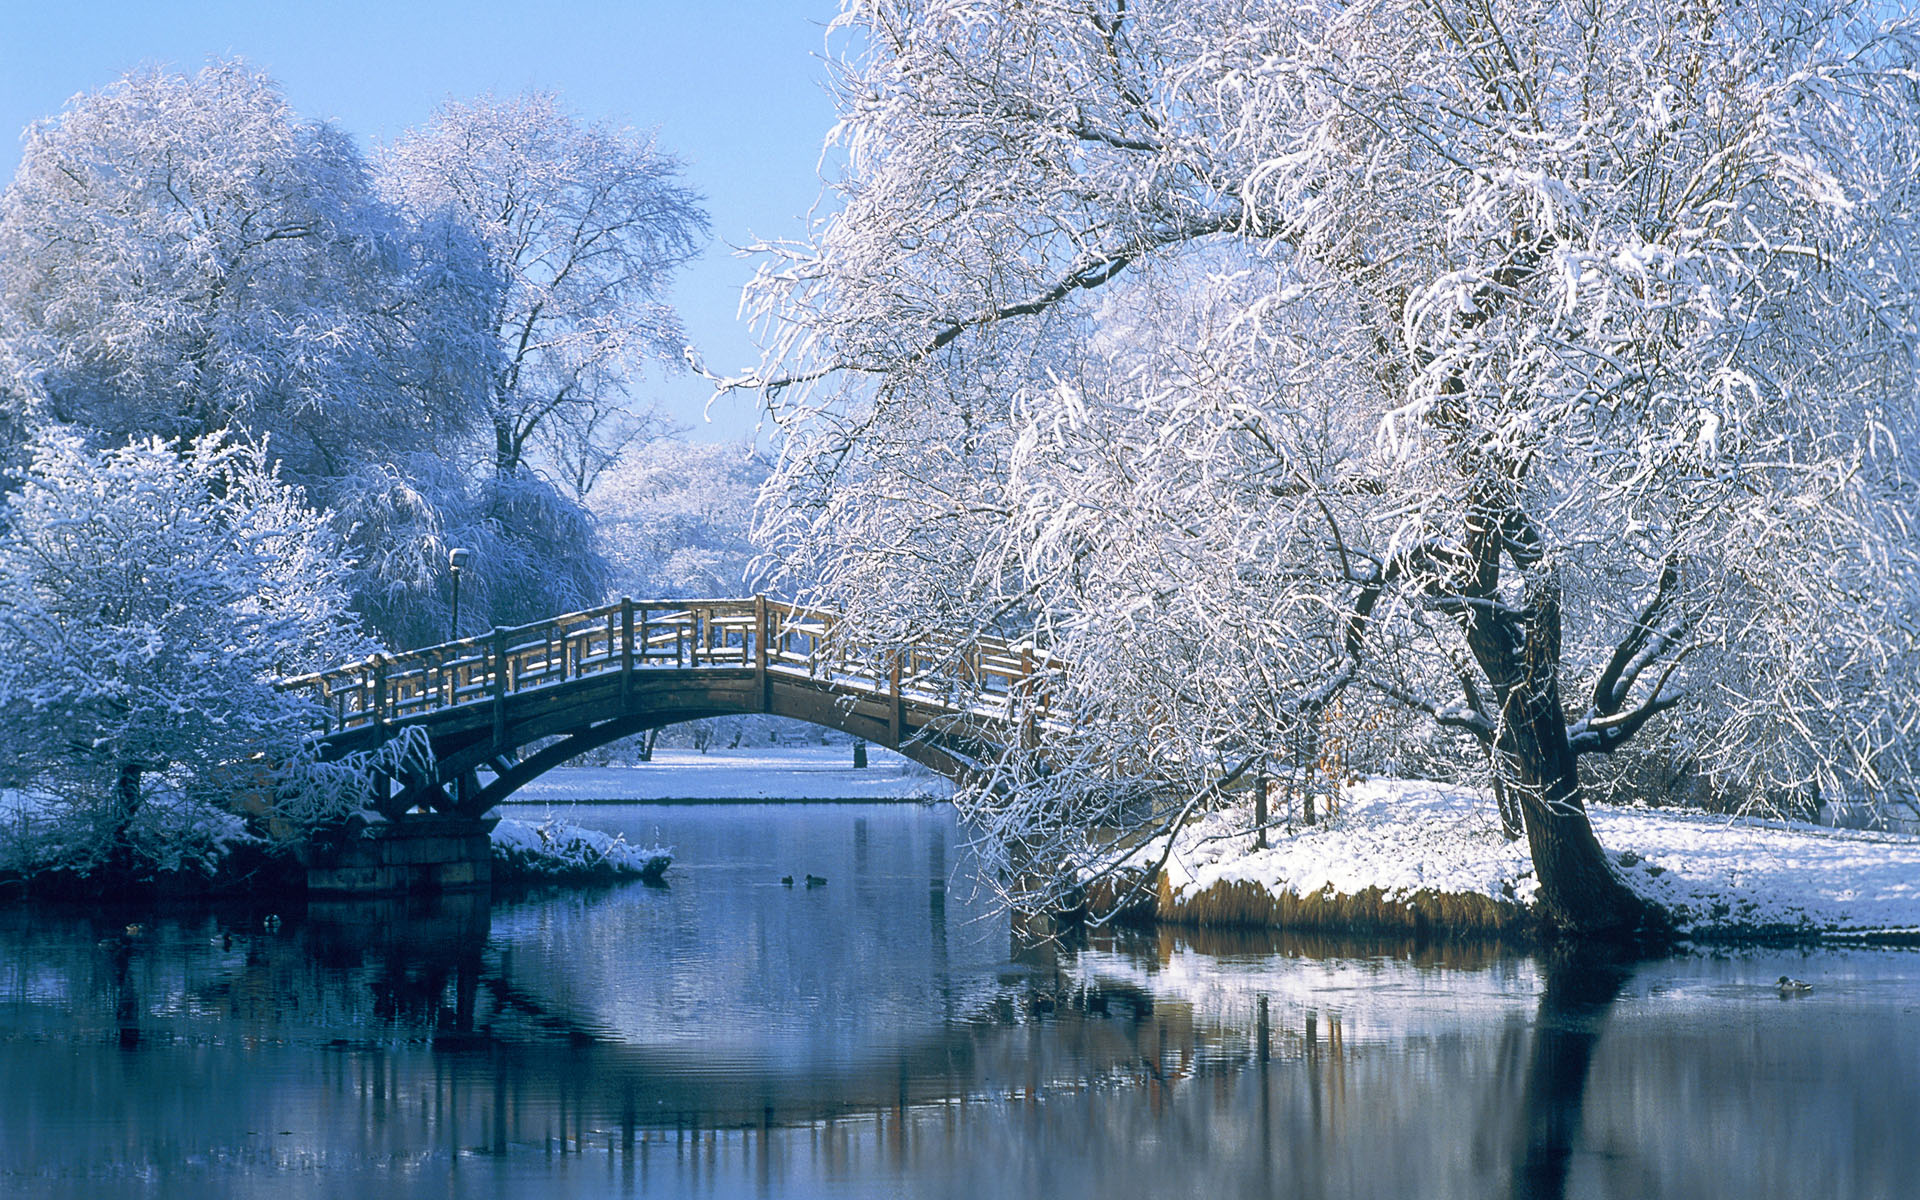 Photography - Winter Landscape Pond Water Bridge Tree Reflection Snow Wallpaper